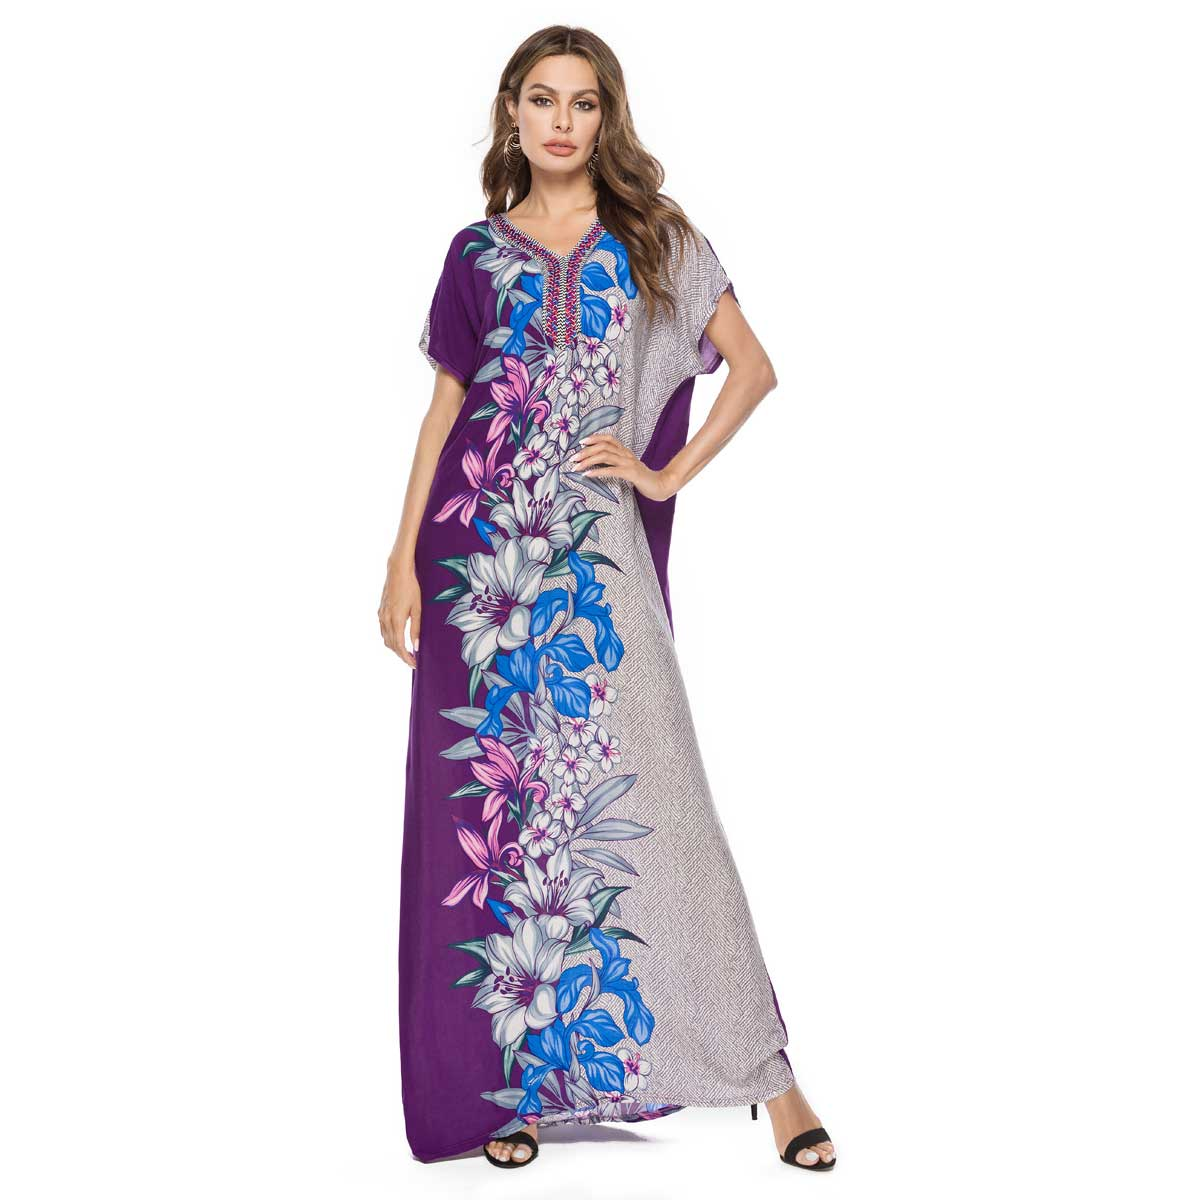 2019 Summer Women Floral Printed Bohemian Maxi Dress Short Sleeve Muslim Abaya Islamic Dubai Arabic UAE Robe Plus Size VKDR1553